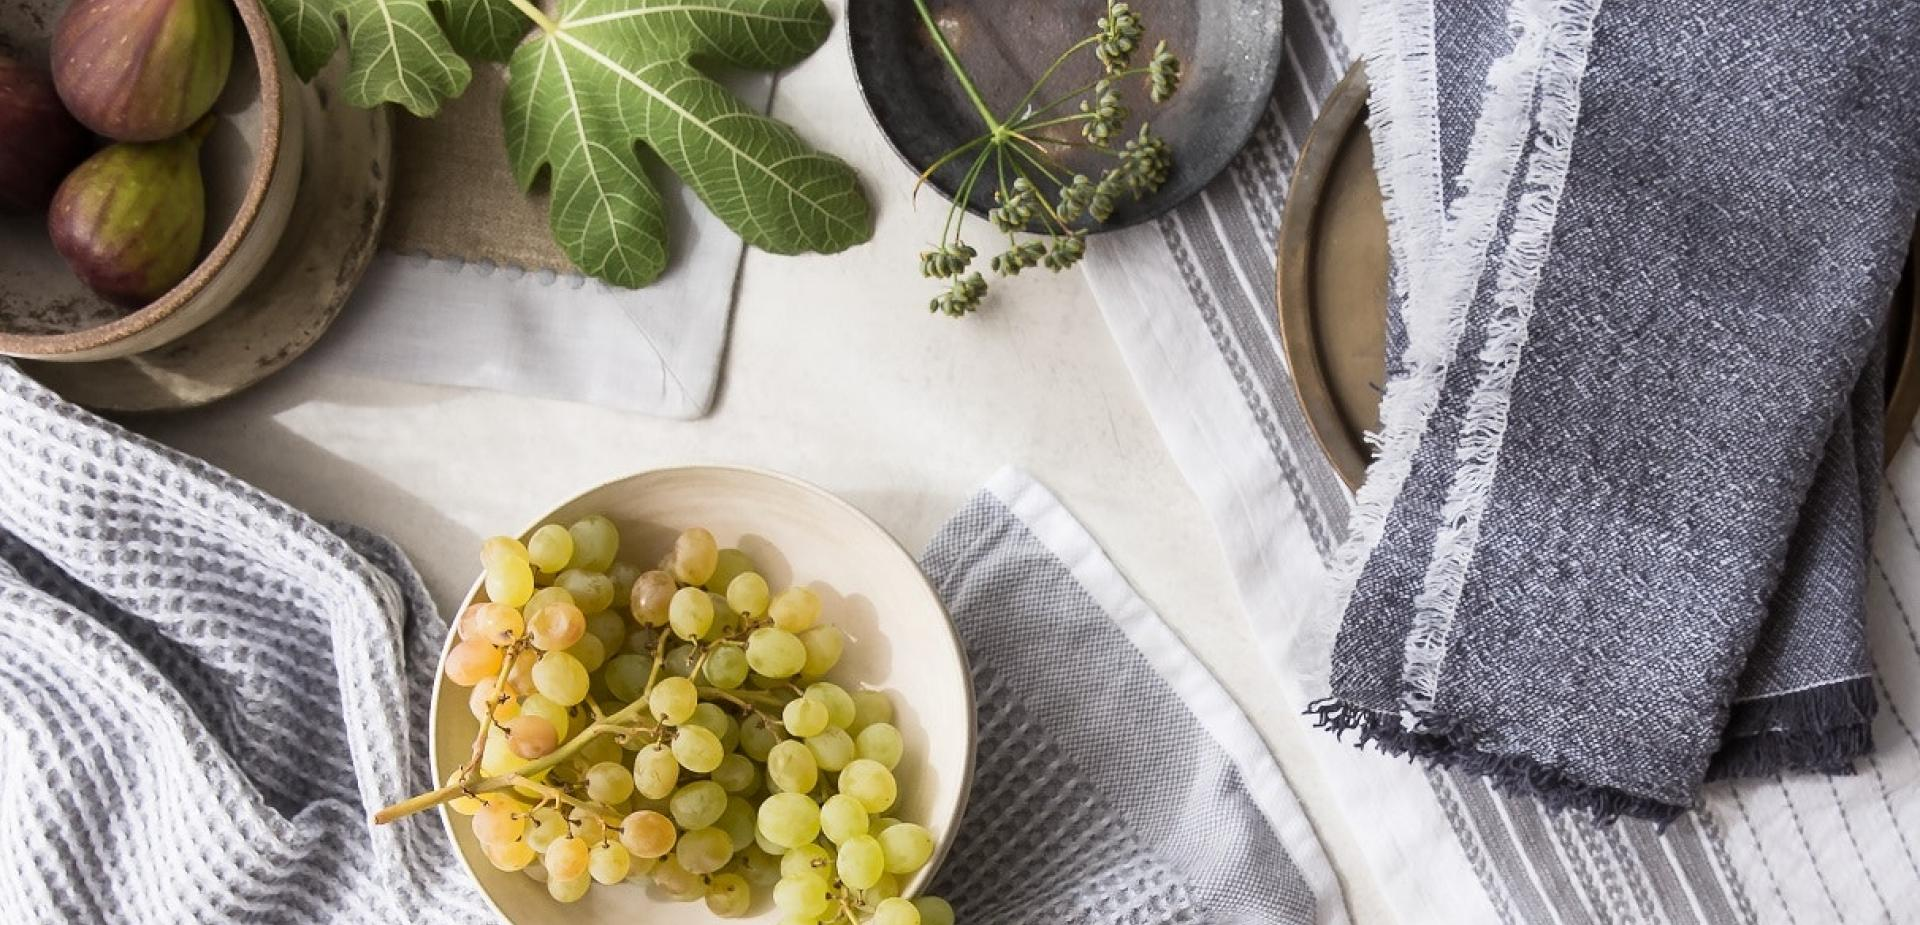 Luxury Organic kitchen Towels